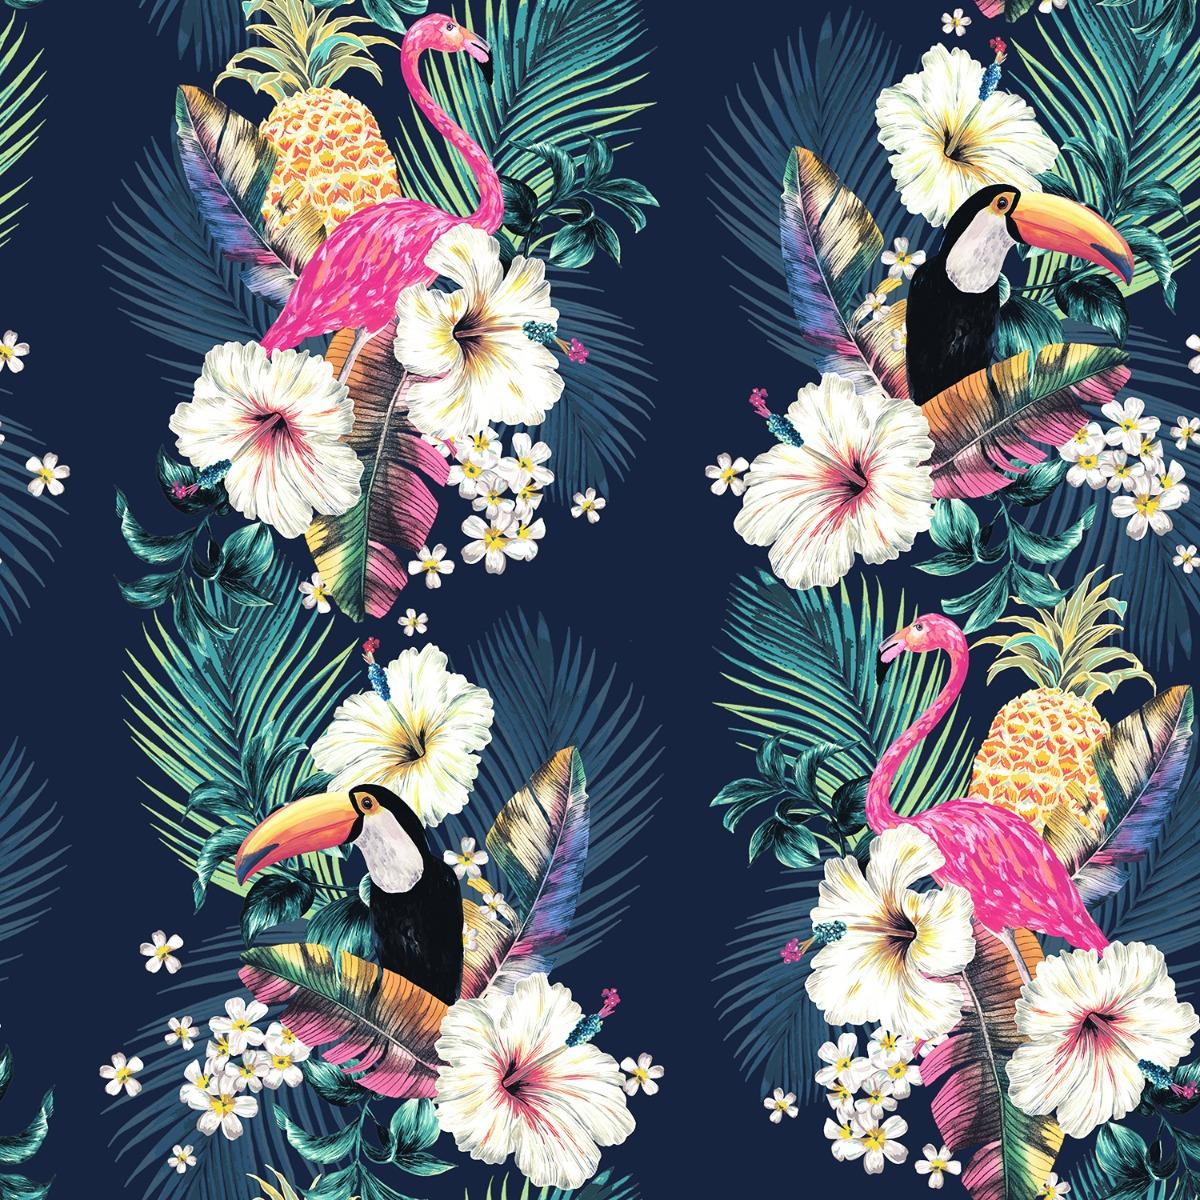 Maui Tropical Wallpaper Multi / Ink Blue Accessorize 274706